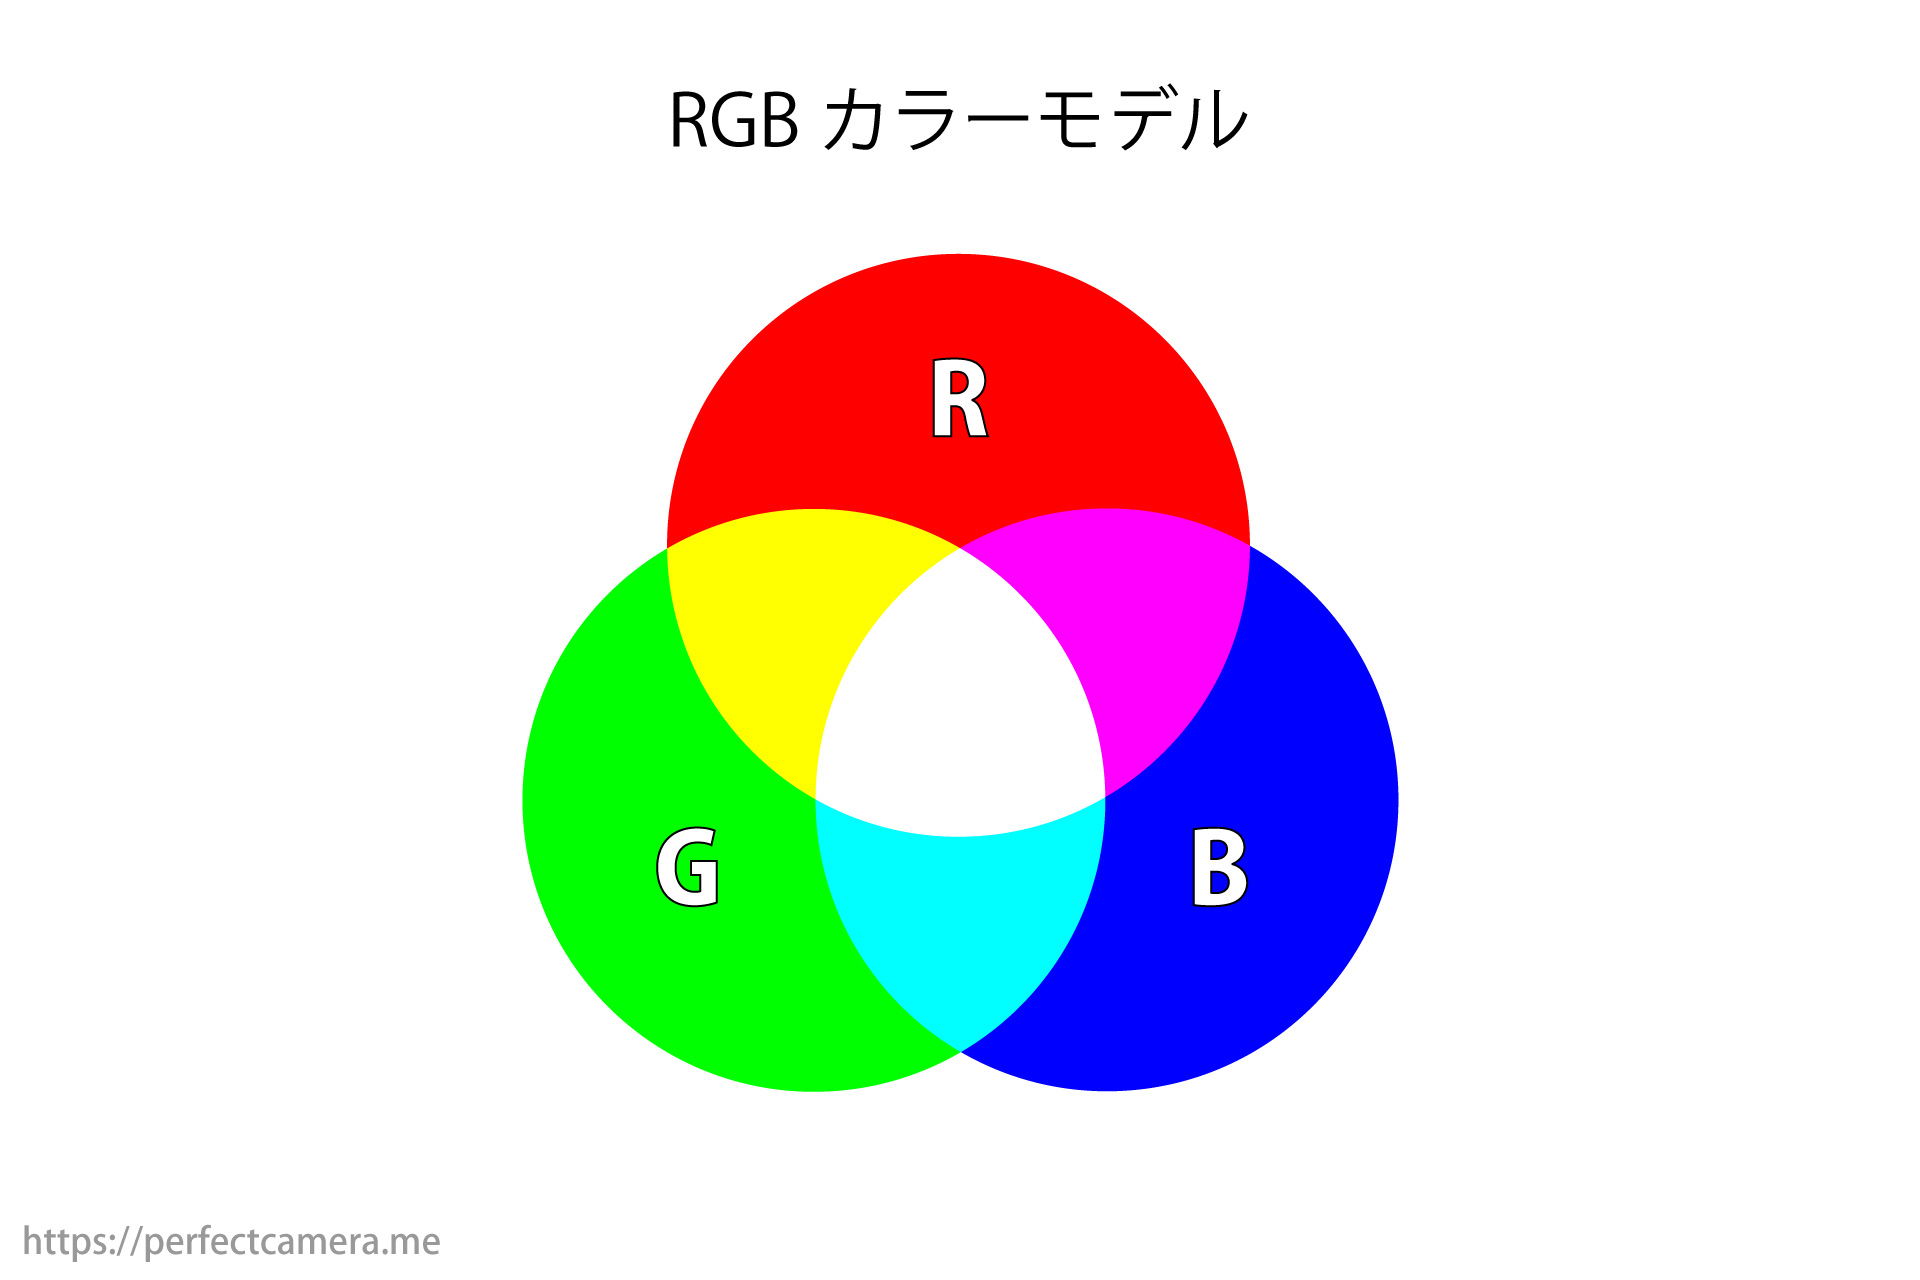 RGBカラーモデル